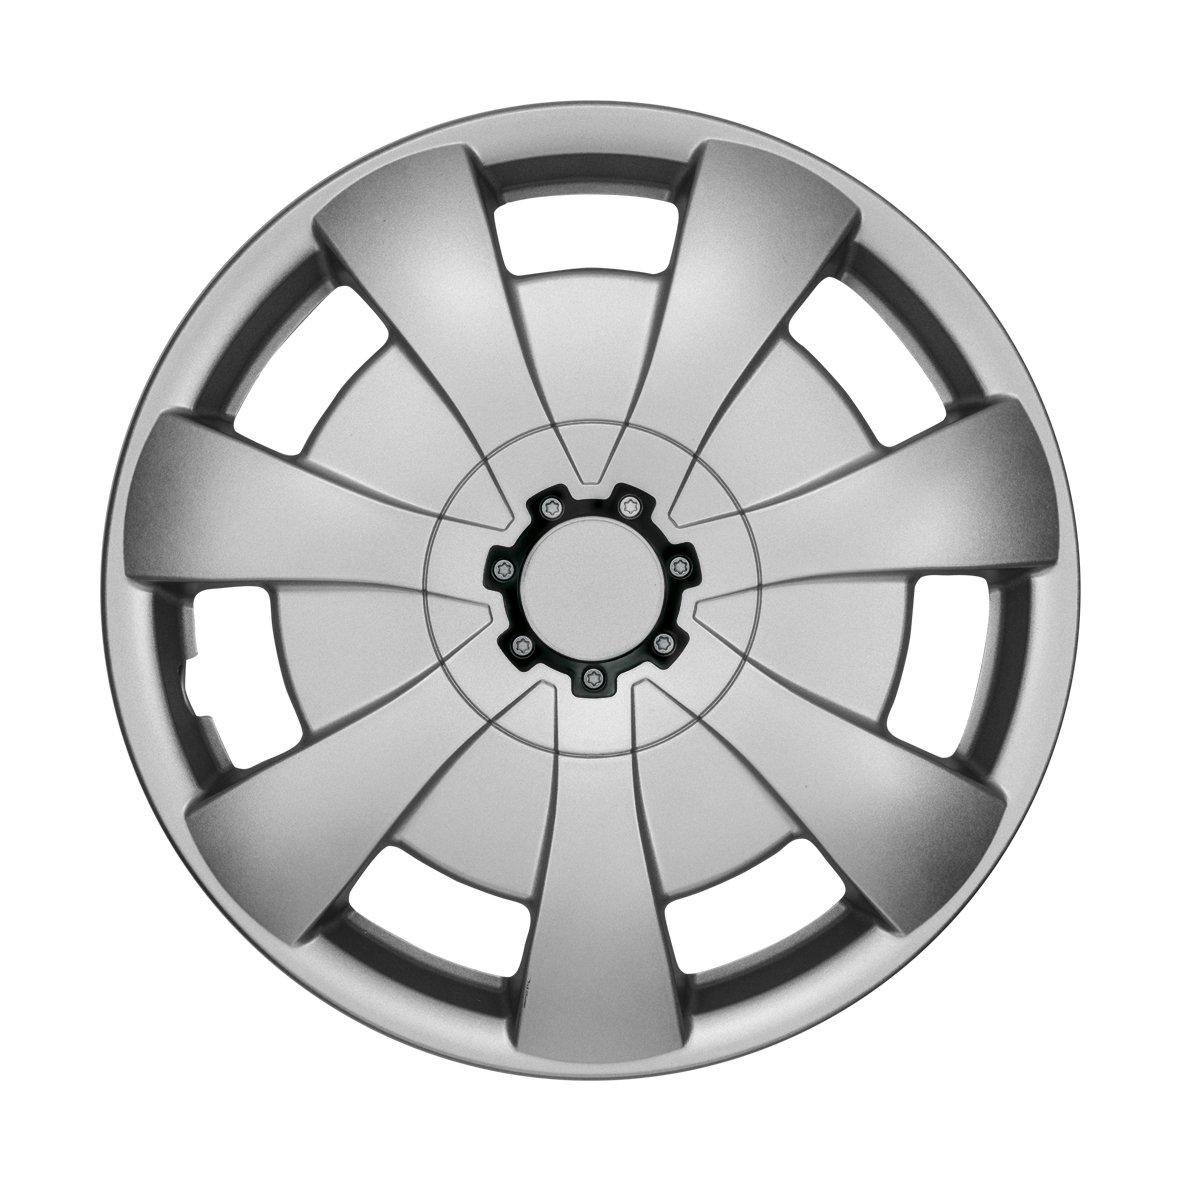 NRM Copricerchi Universali AXEL Silver 15 set 4 pezzi